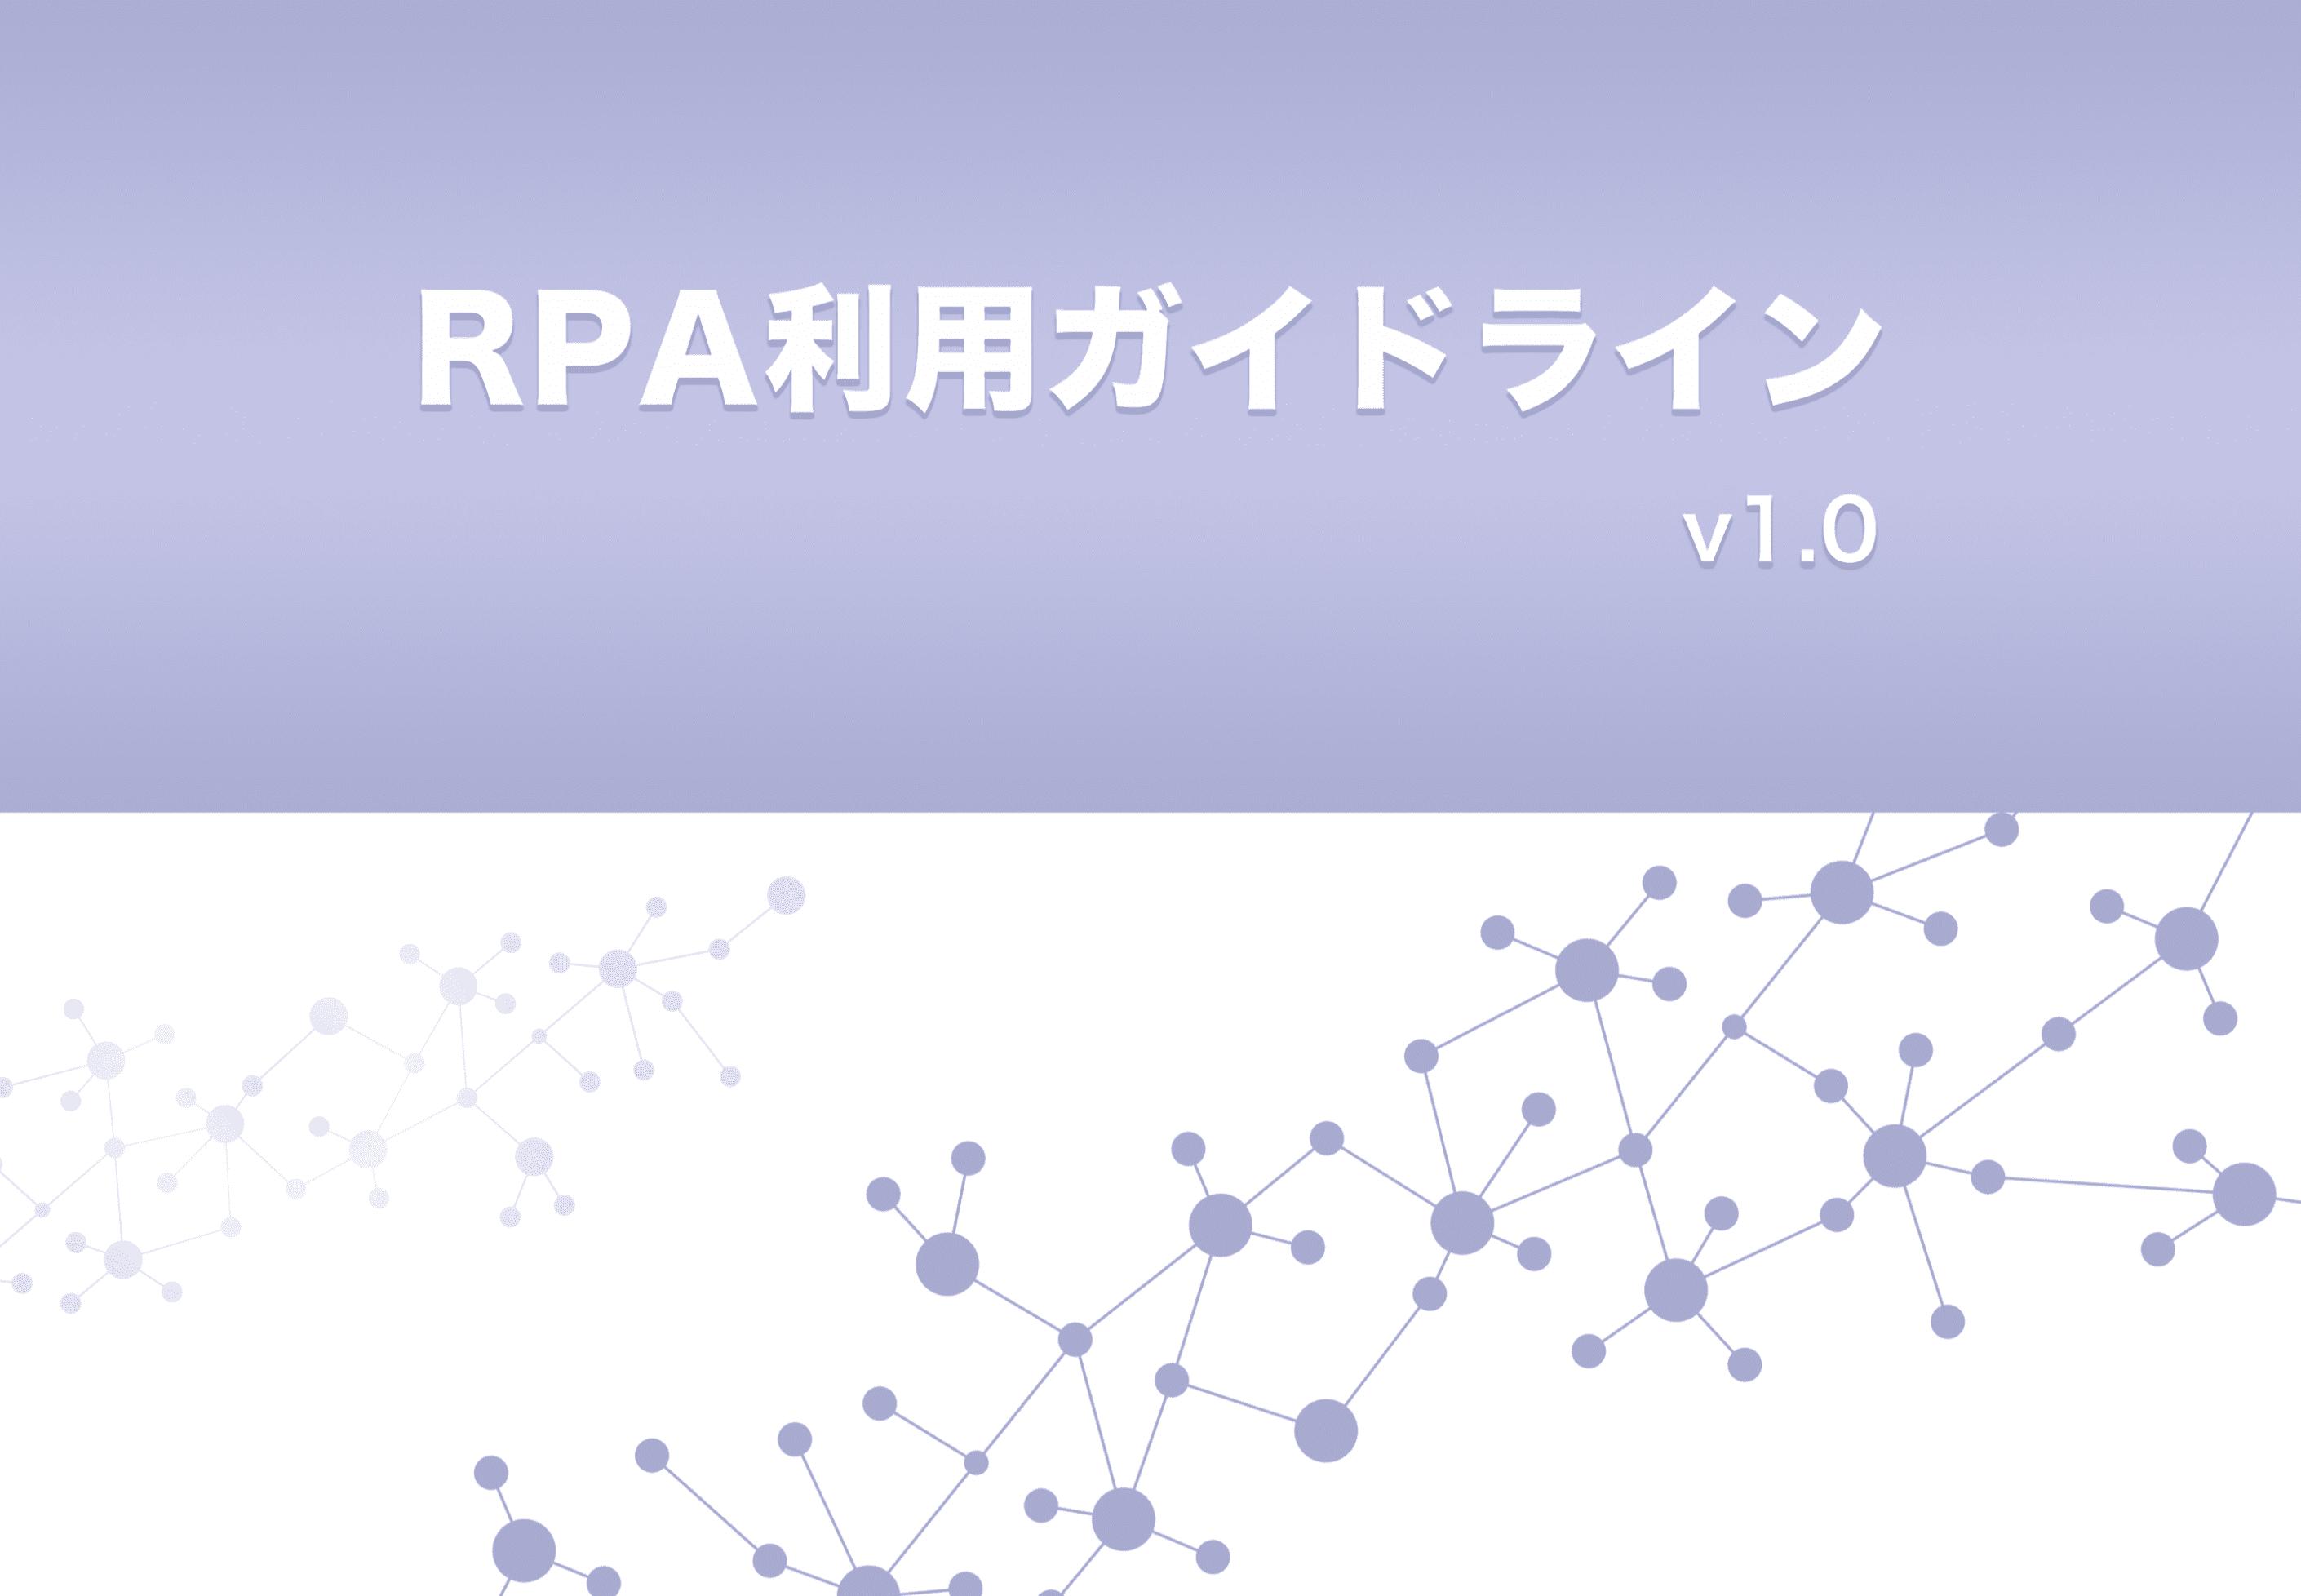 RPA導入した企業の役に立つ<br>RPA利用ガイドライン